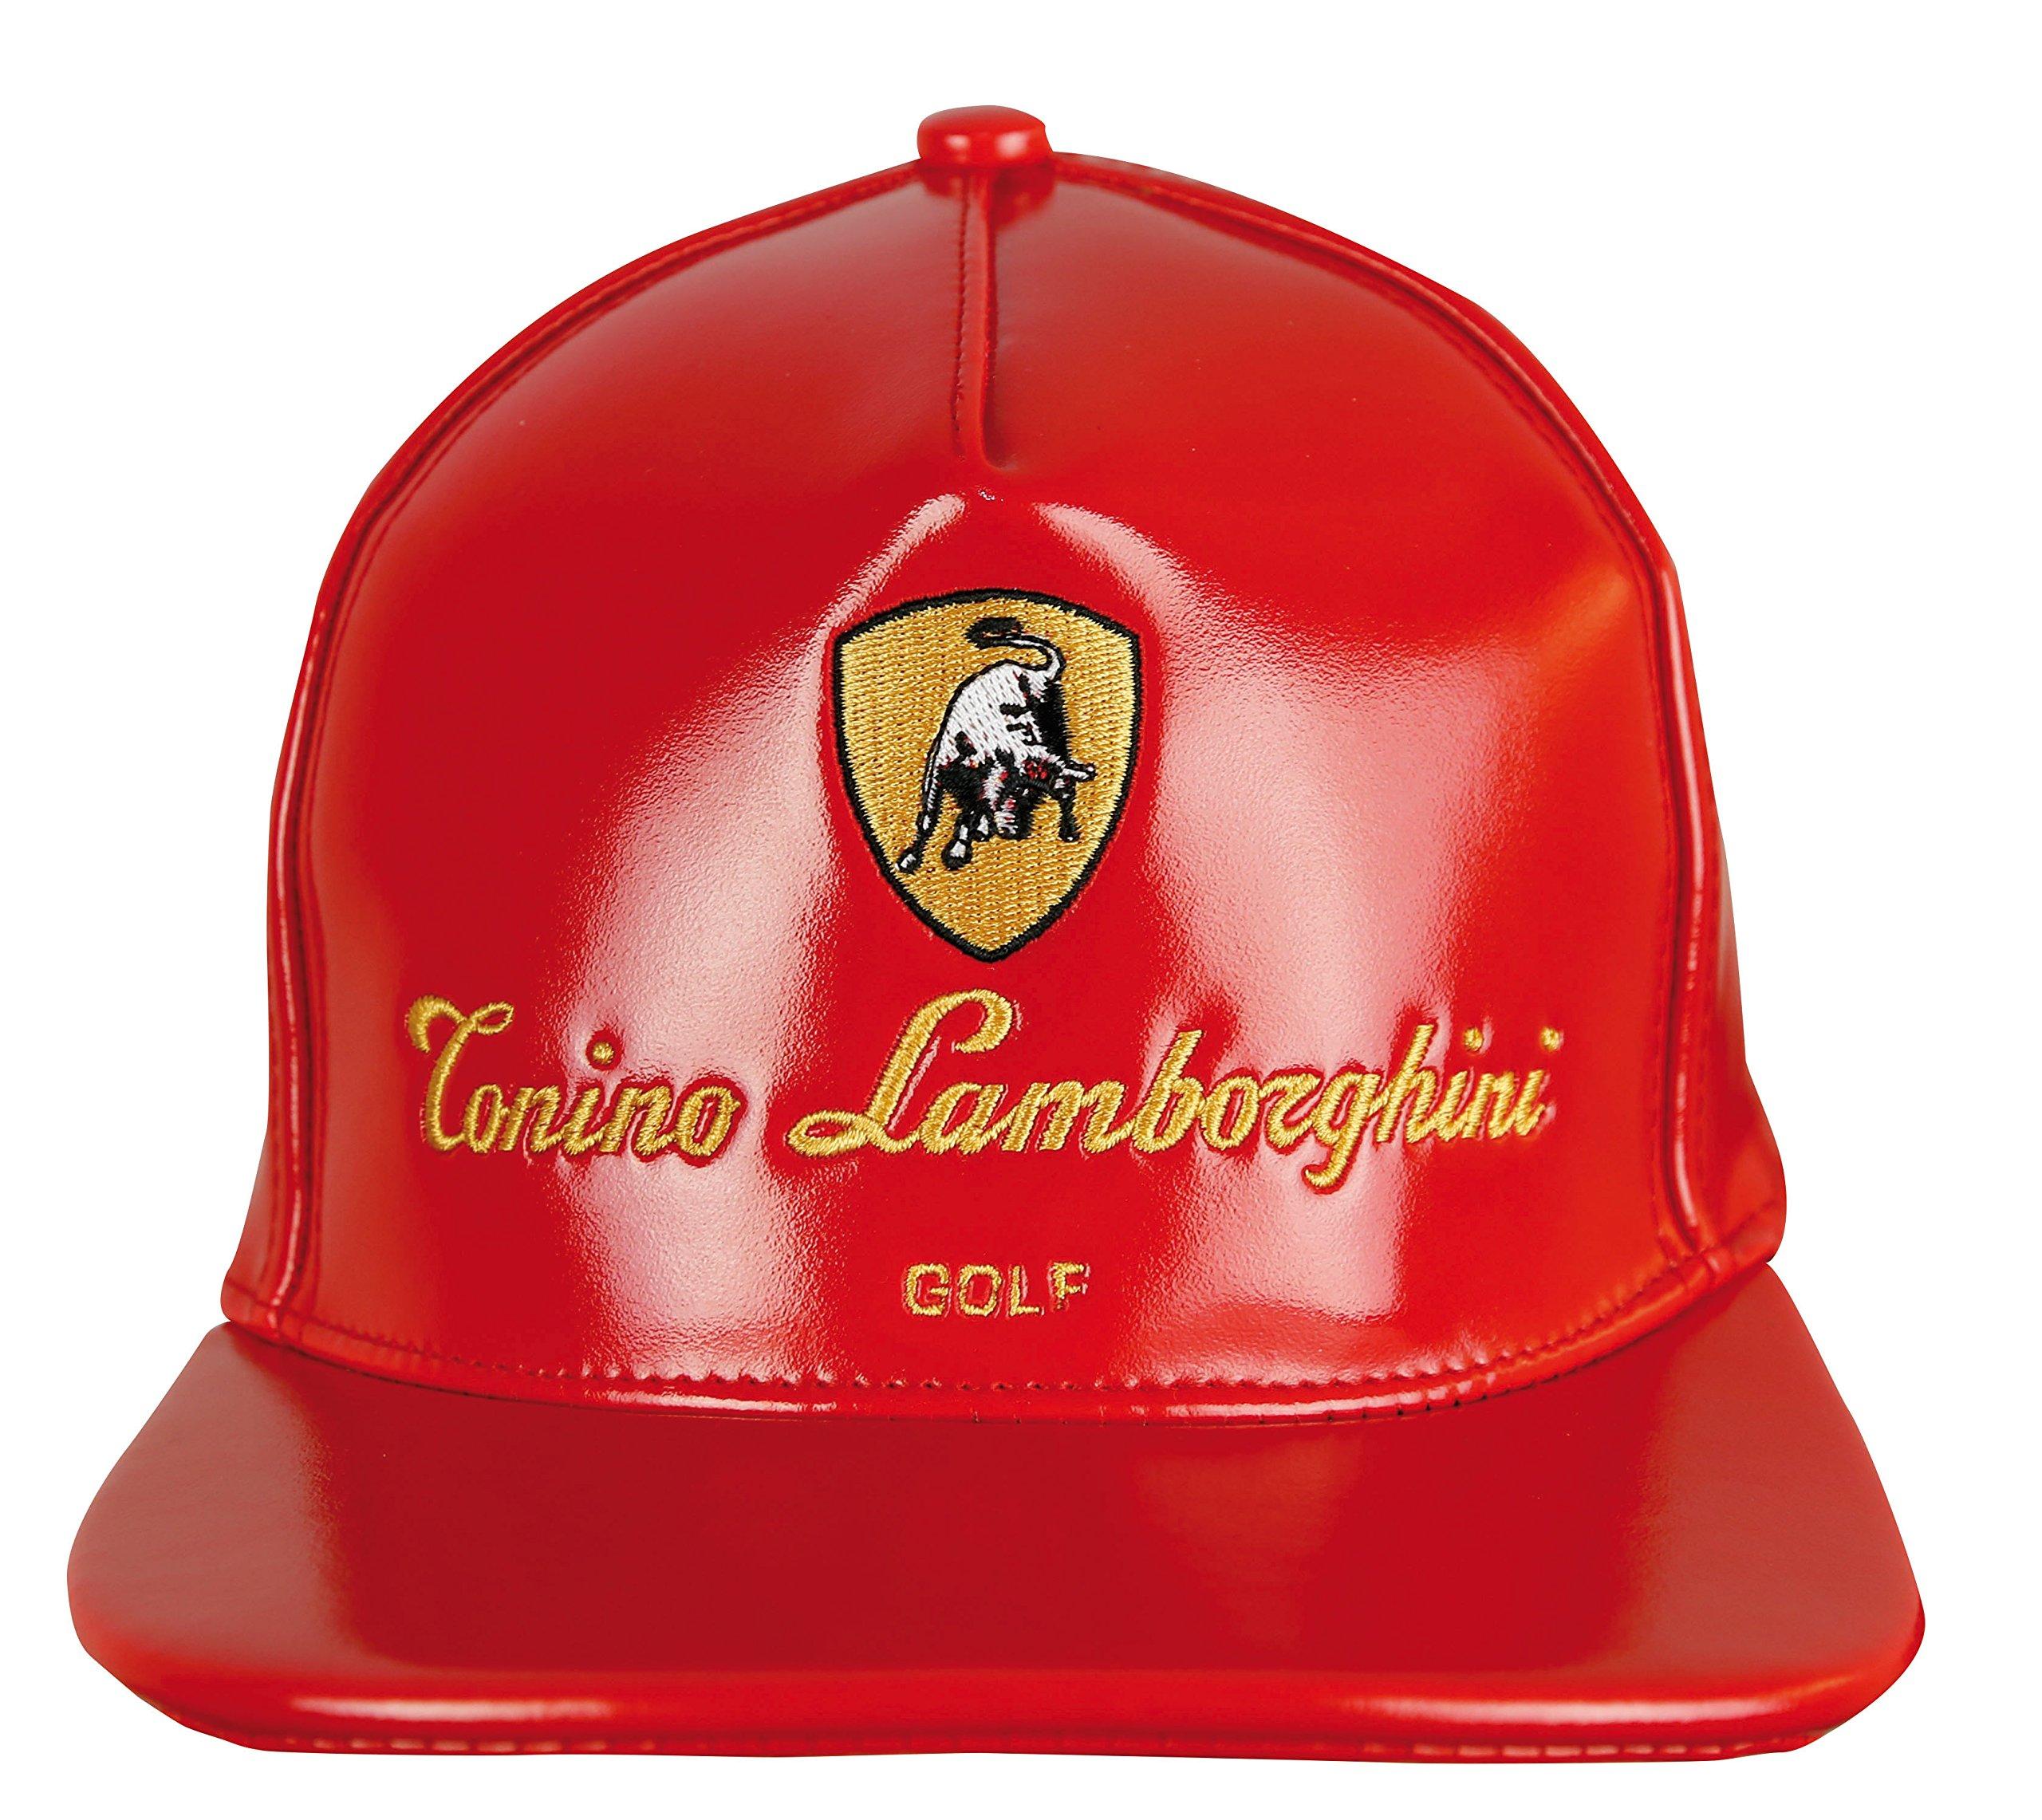 Tonino Lamborghini Unisex Synthetic Leather Golf Cap